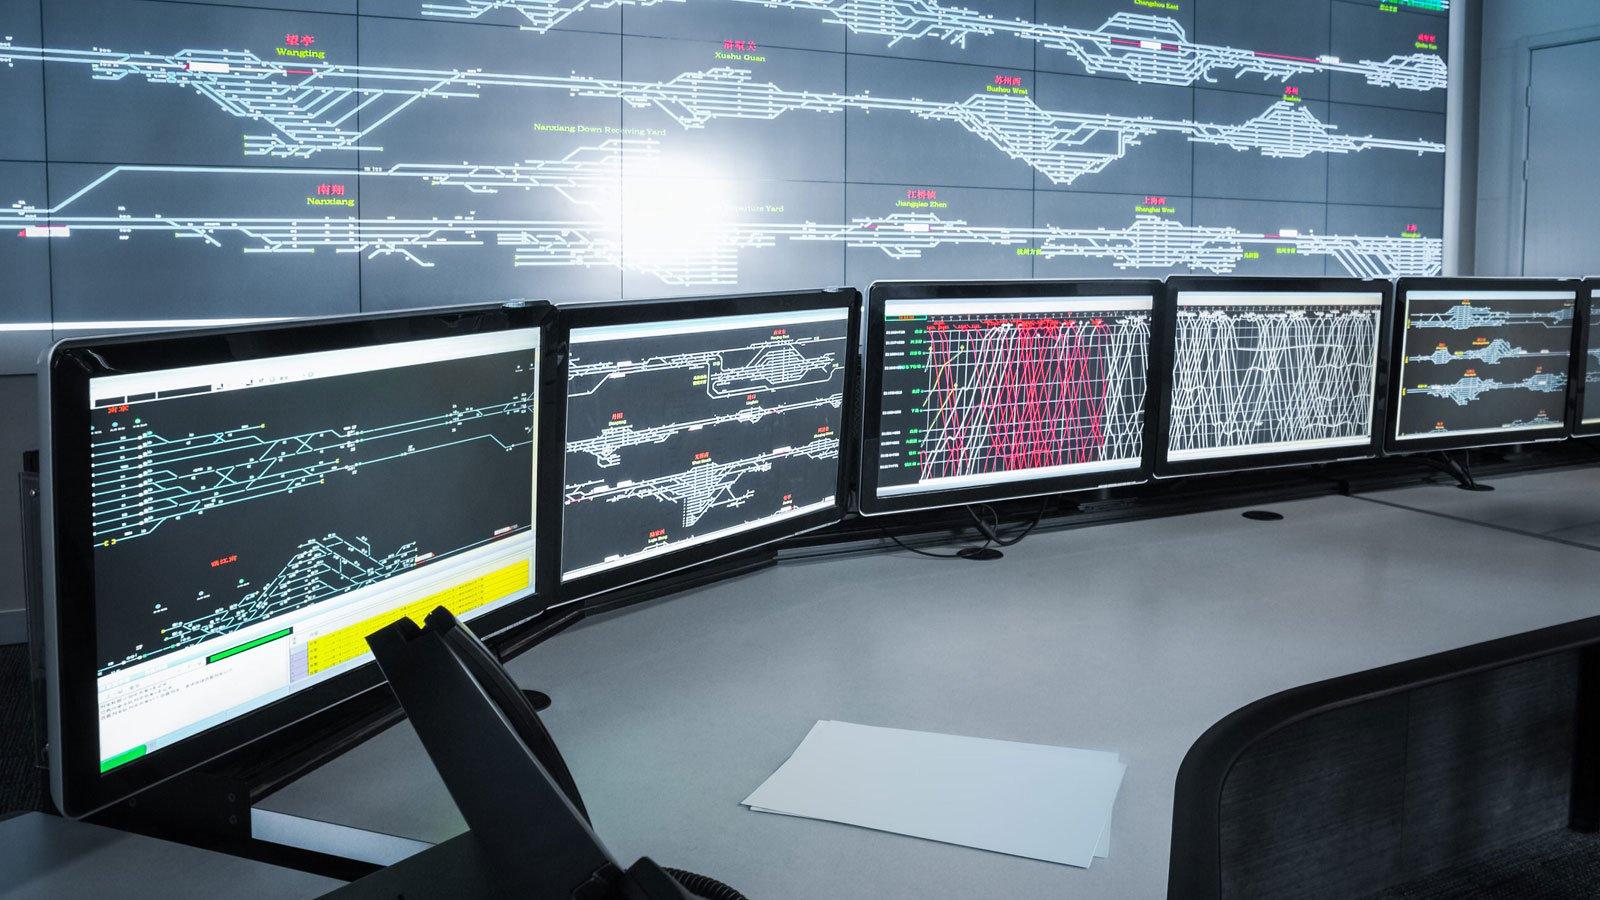 Stonewall Facilities Engineering Automation Controls SCADA